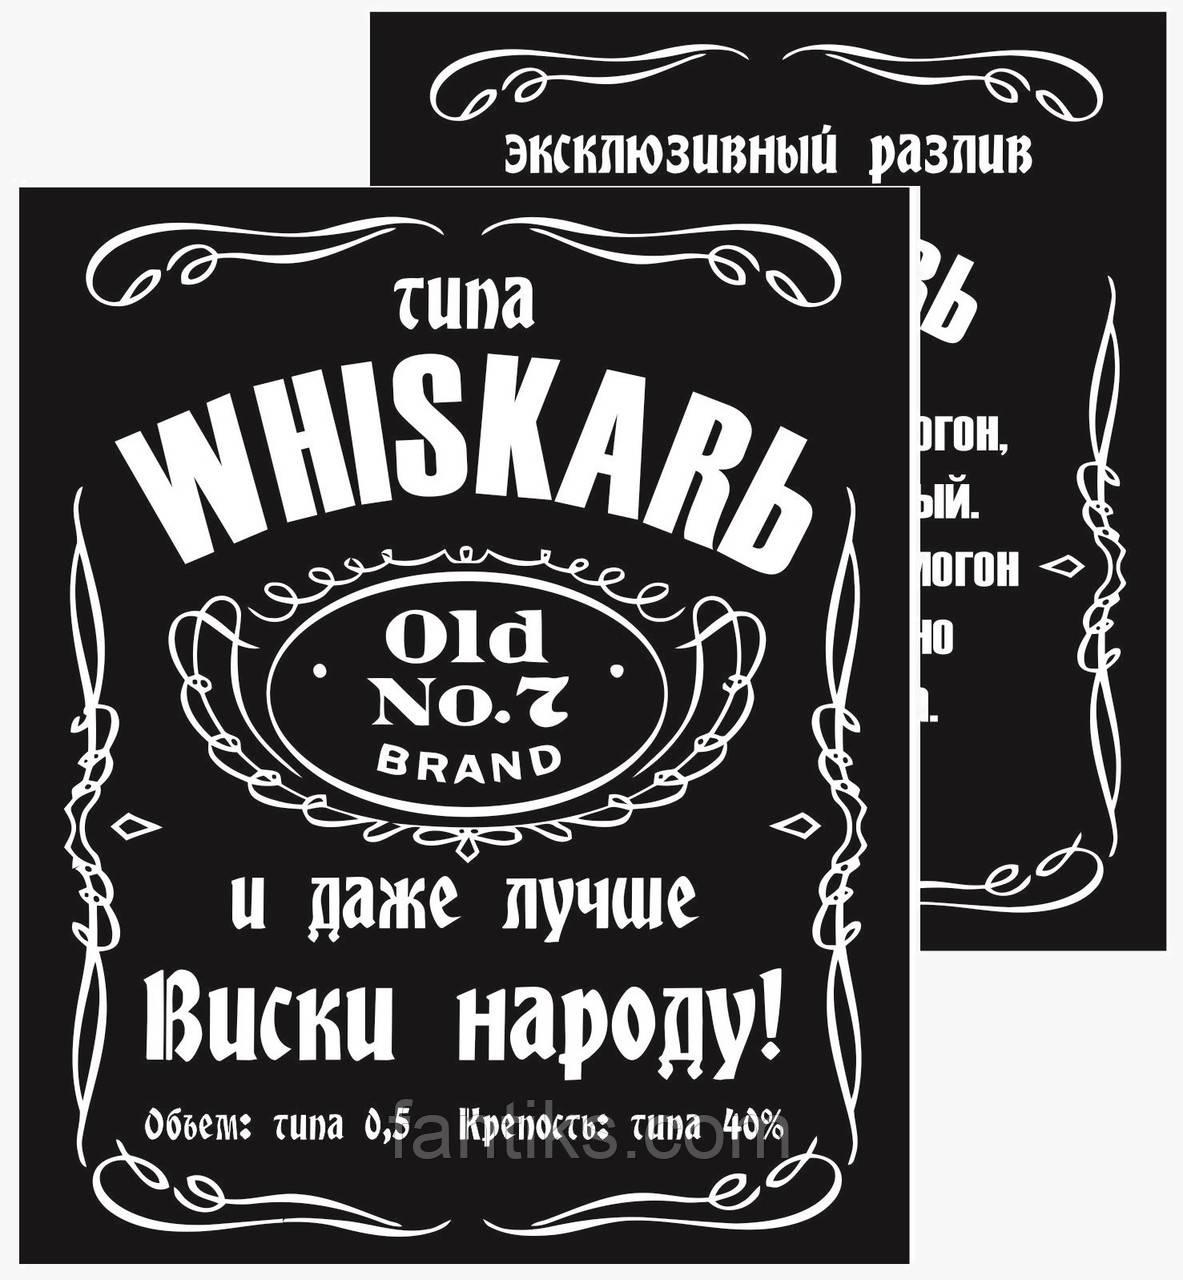 Типа WHISKARЬ - наклейка на бутылку - ФАНТИК в Харькове